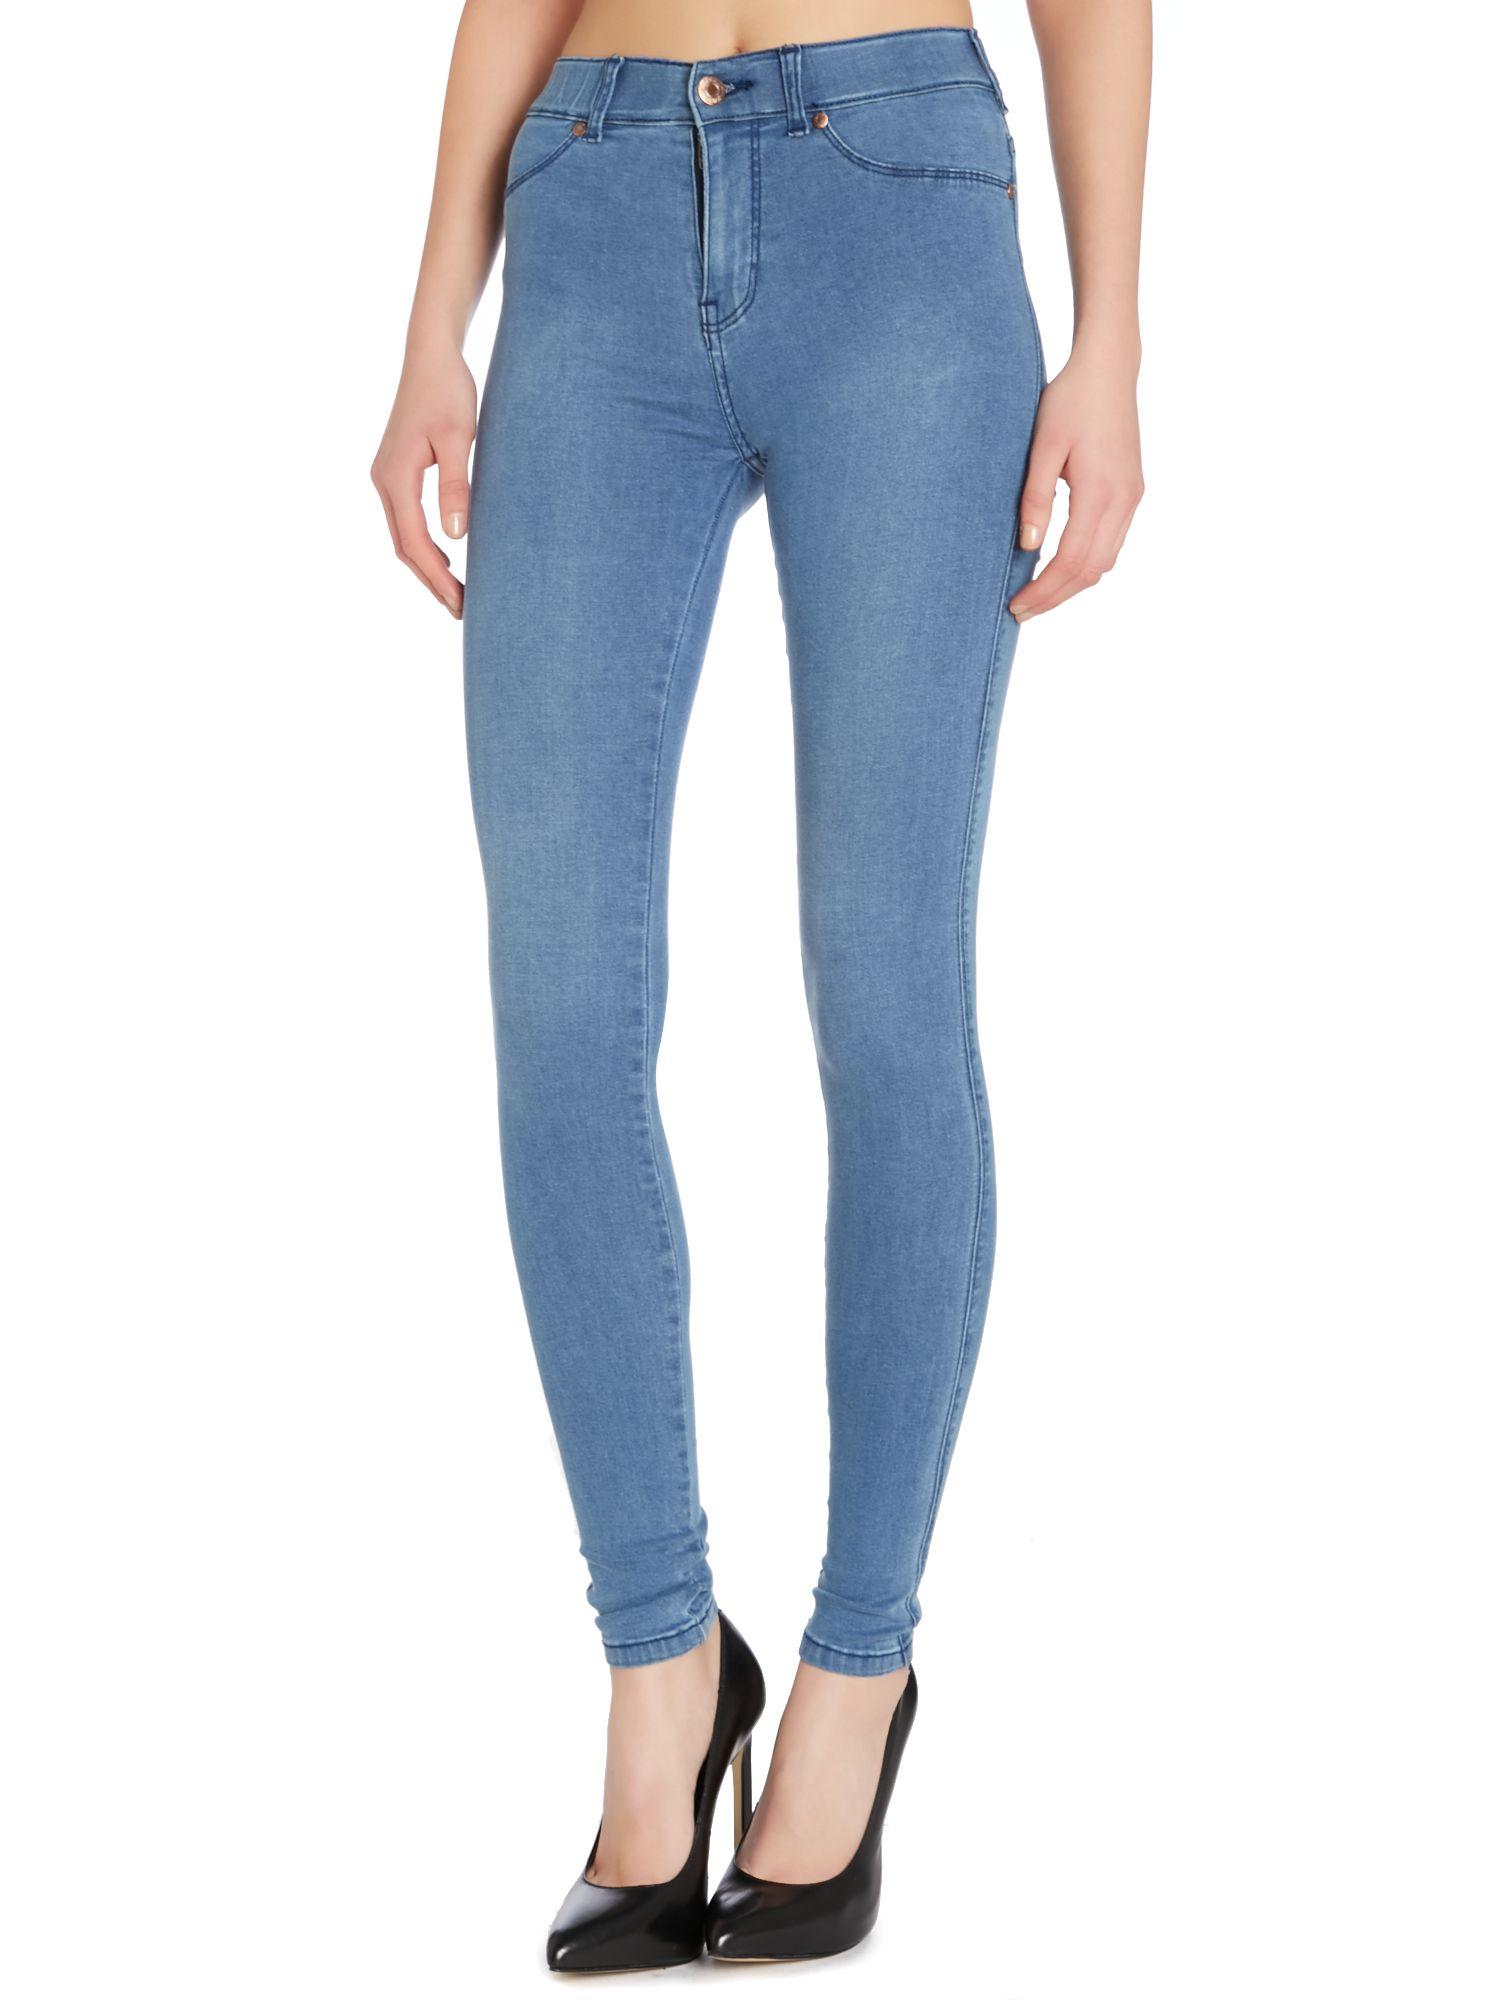 Light Denim High Rise Distressed Skinny Jeans. $ Quick View Medium Denim Layered Cross Strap Romper. $ Quick View Navy Solid High Rise Skinny Jeans. $ Quick View.